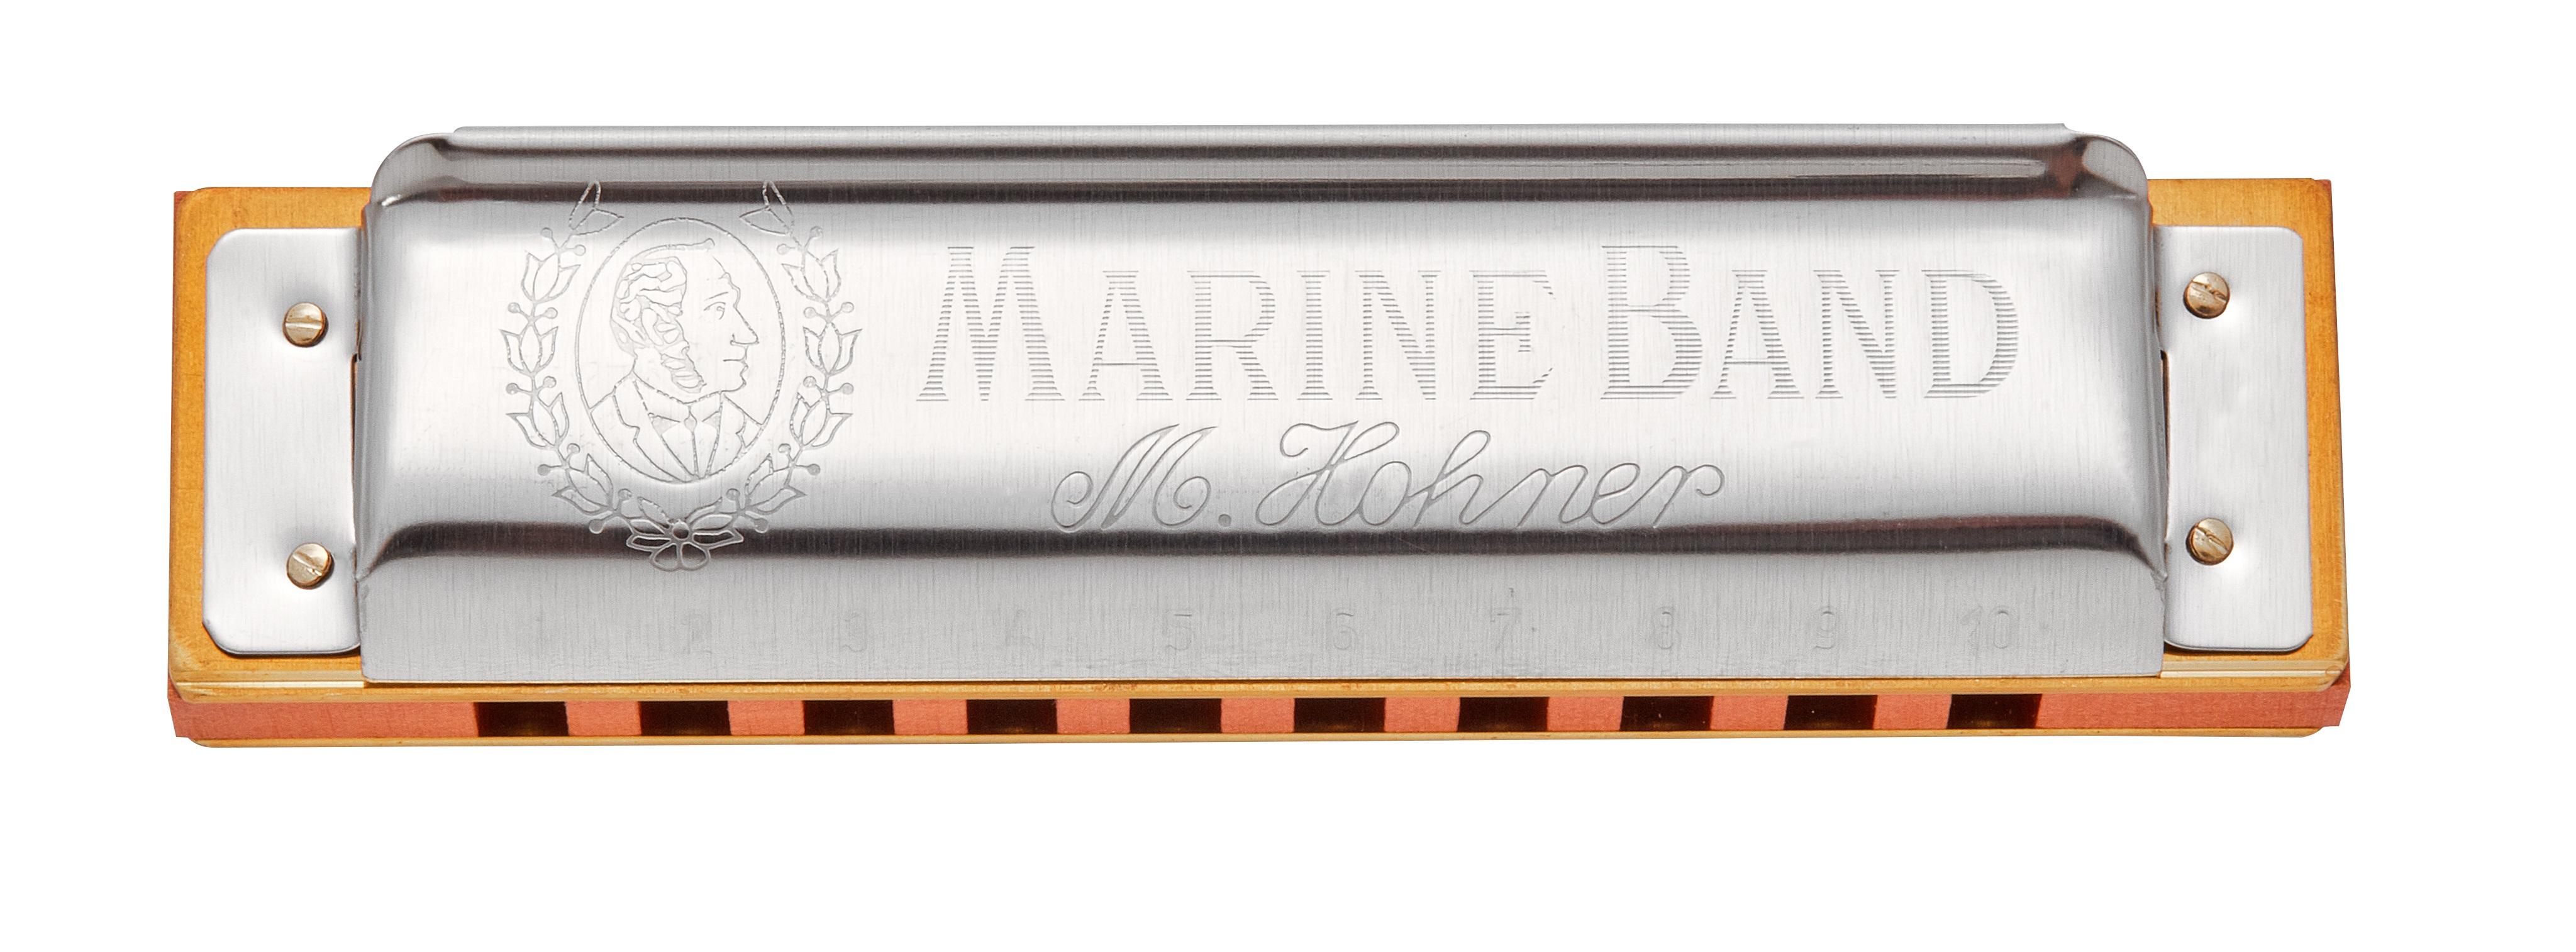 Hohner Marine Band 1896 A-harmonic minor